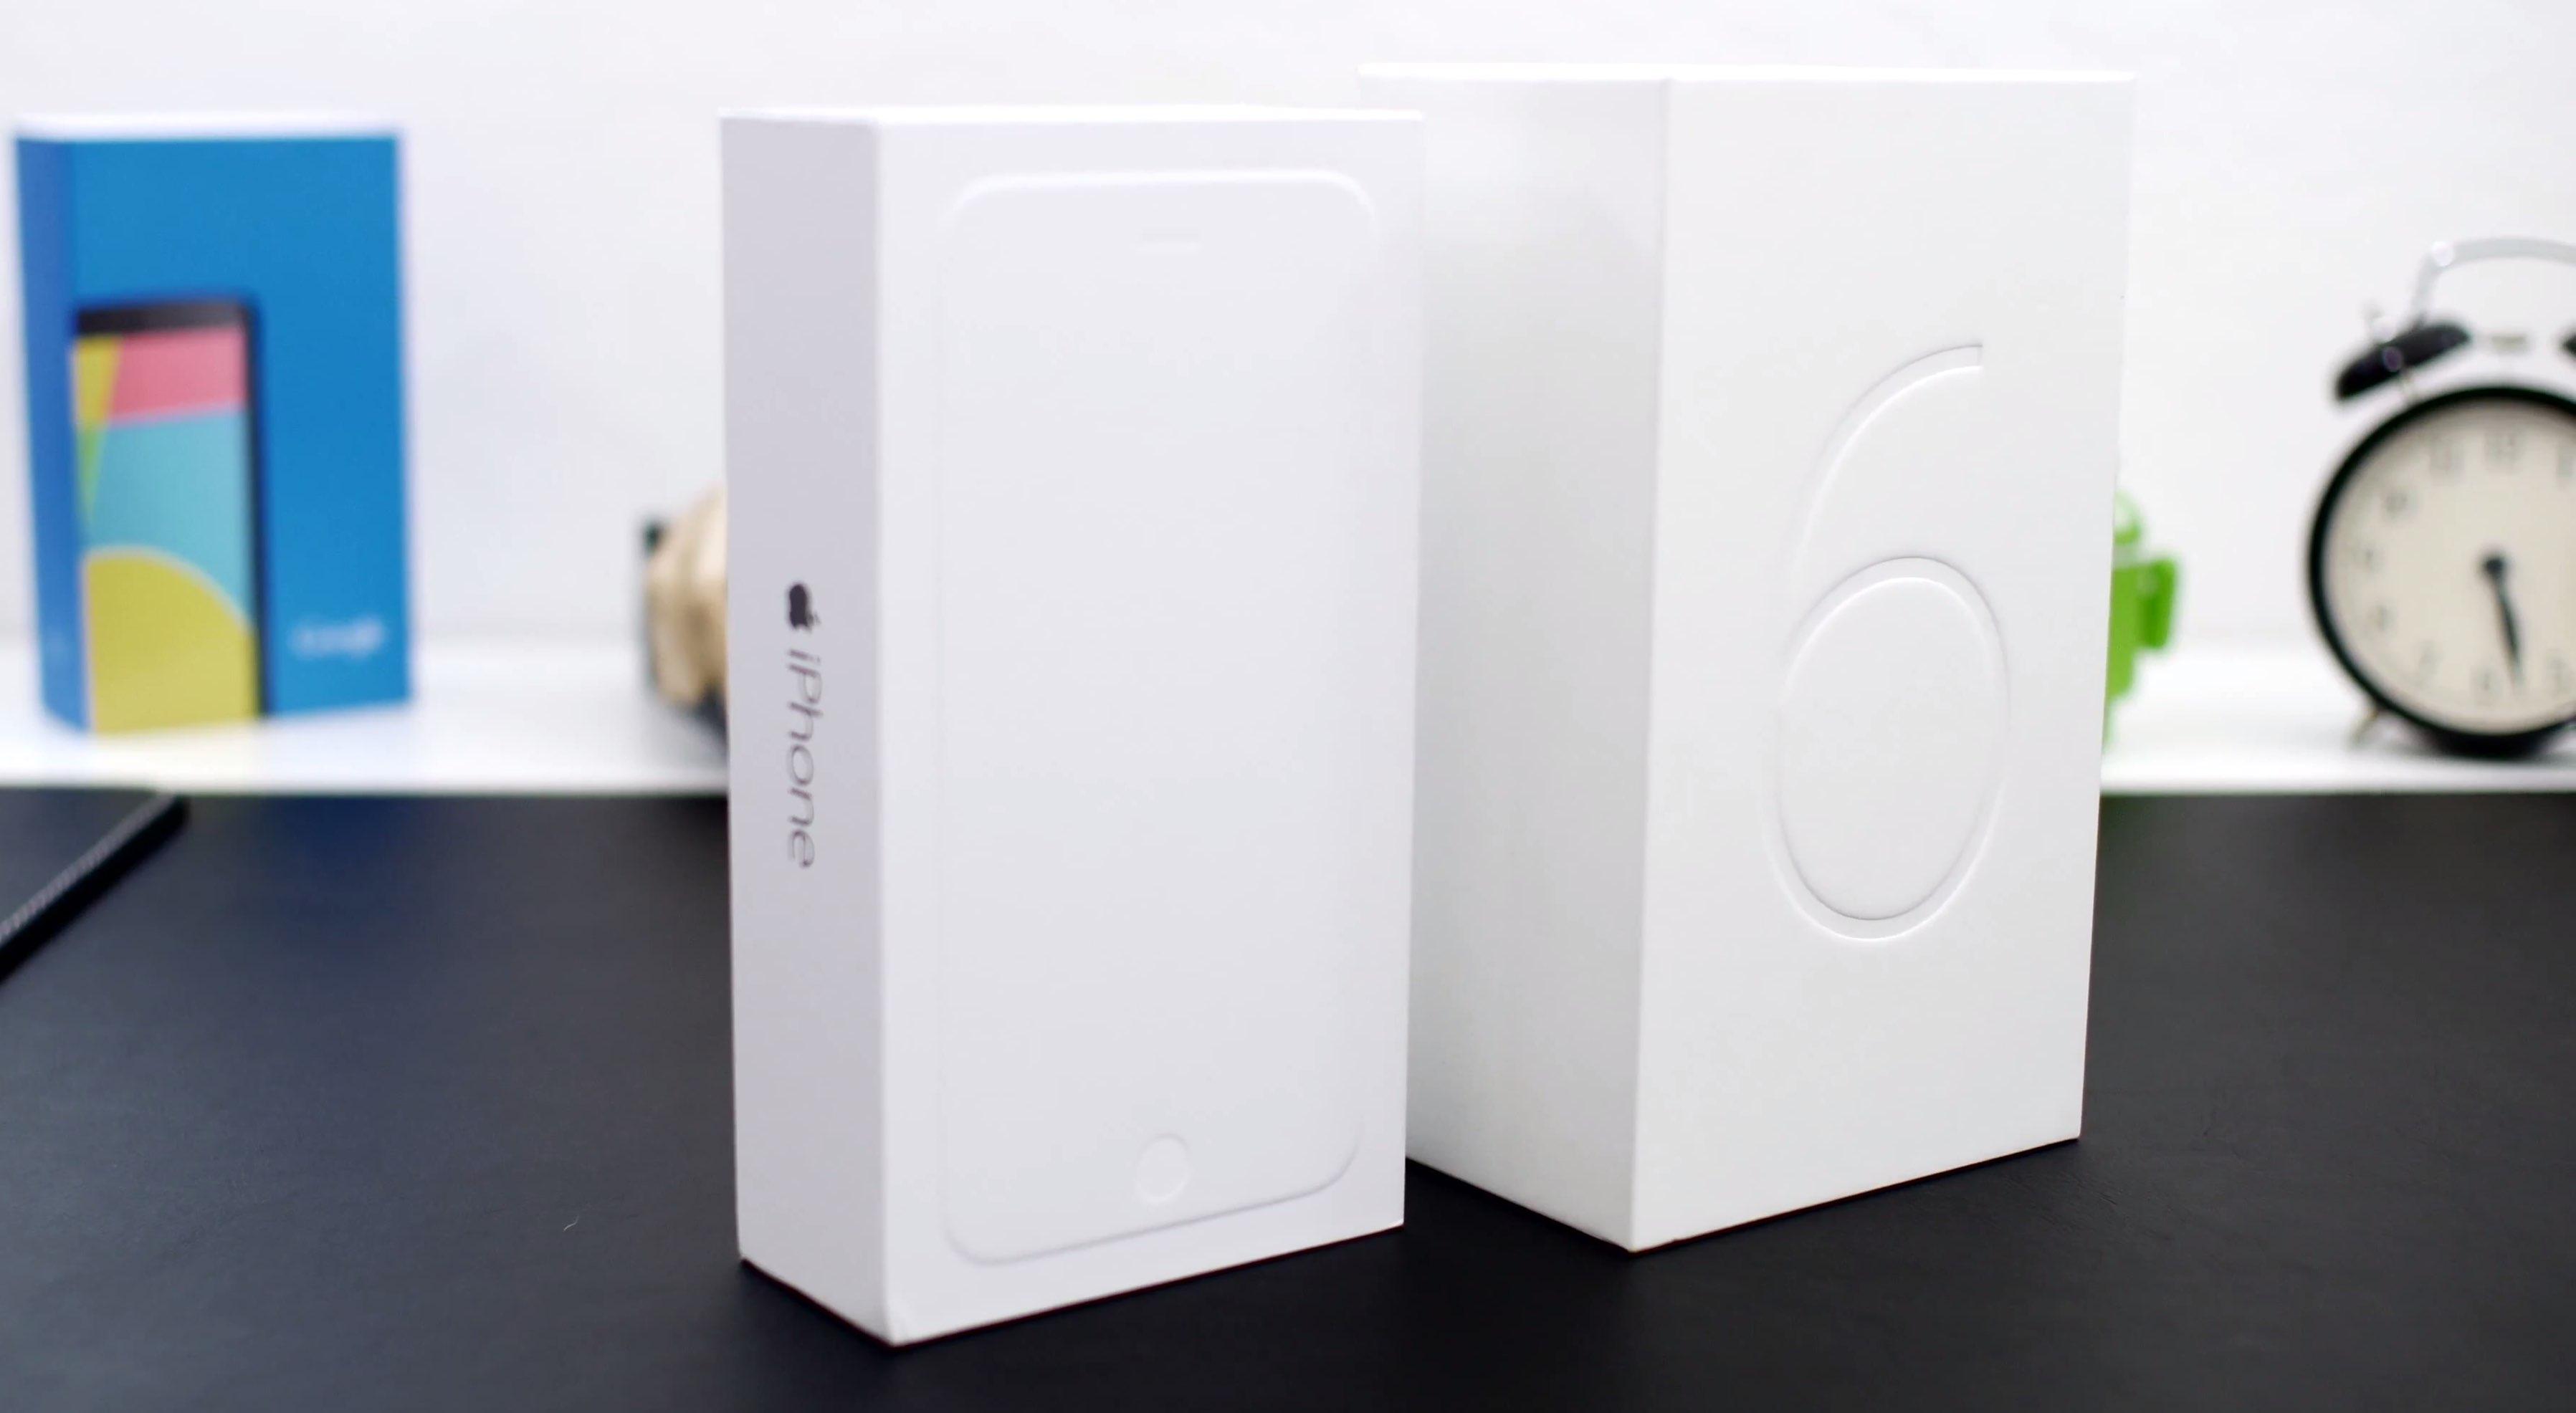 vergleich iphone 6 plus vs nexus 6 im video. Black Bedroom Furniture Sets. Home Design Ideas